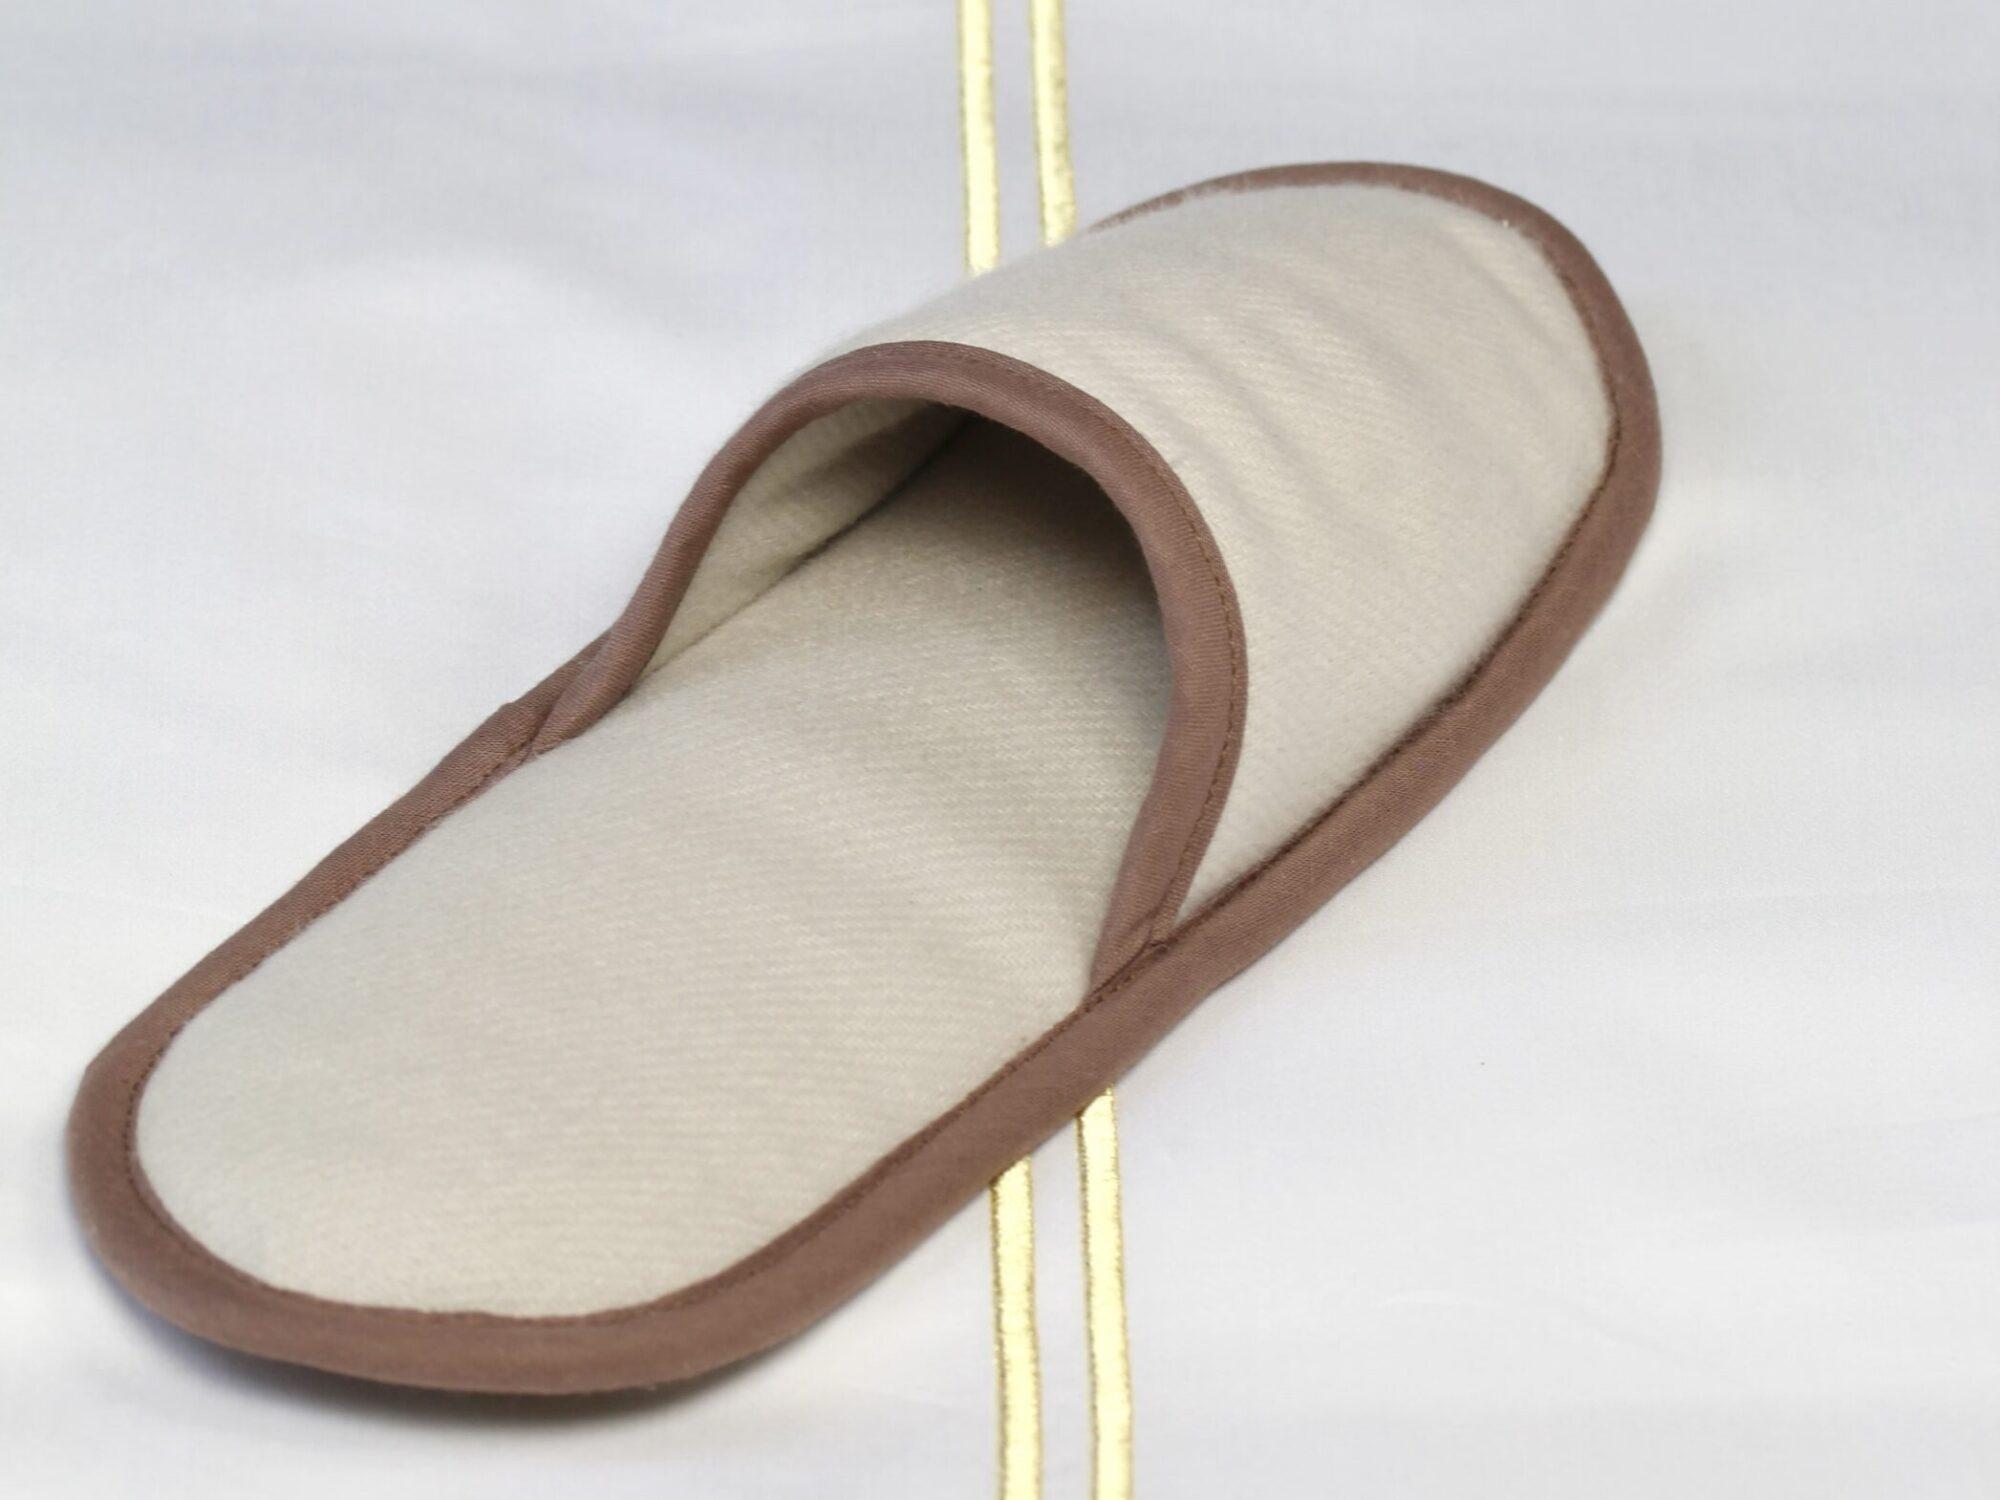 Slippers CBD